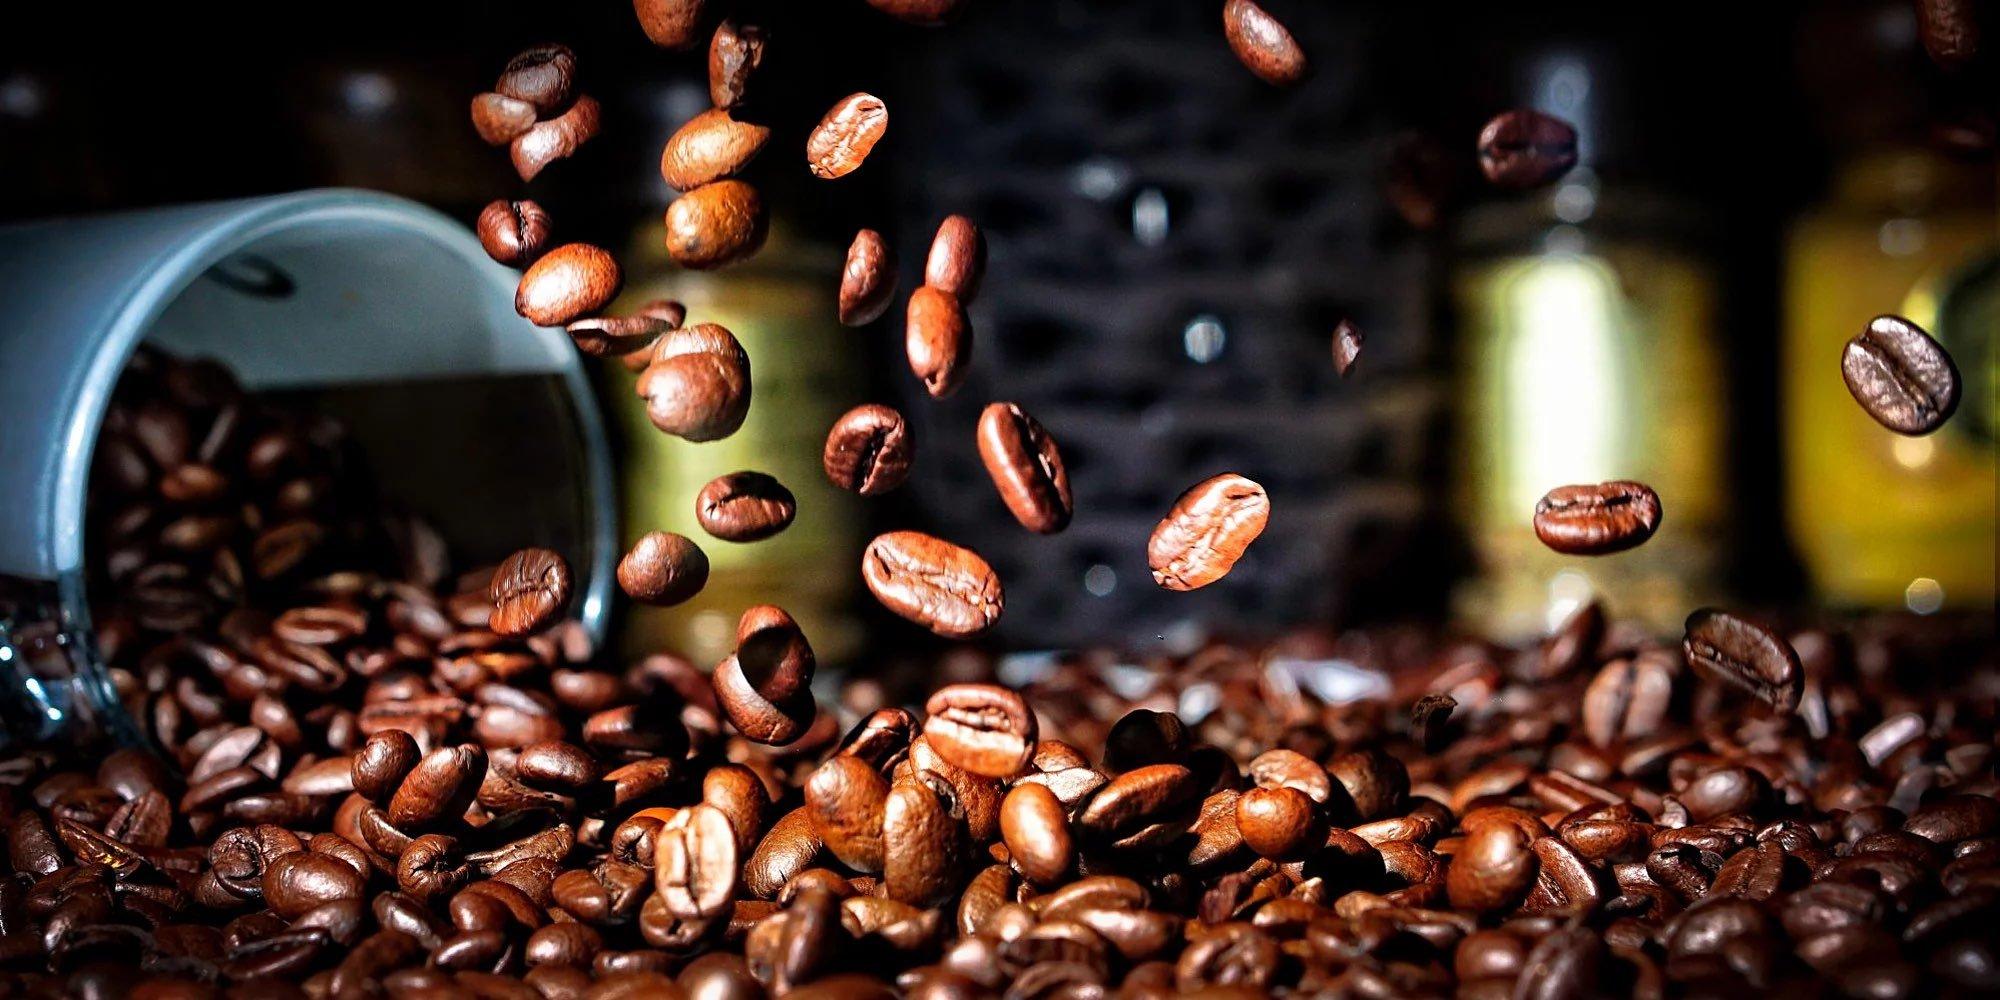 Java Burn Reviews - A Cutting Edge Weight Loss Coffee Powder that's Powerful! - SF Weekly